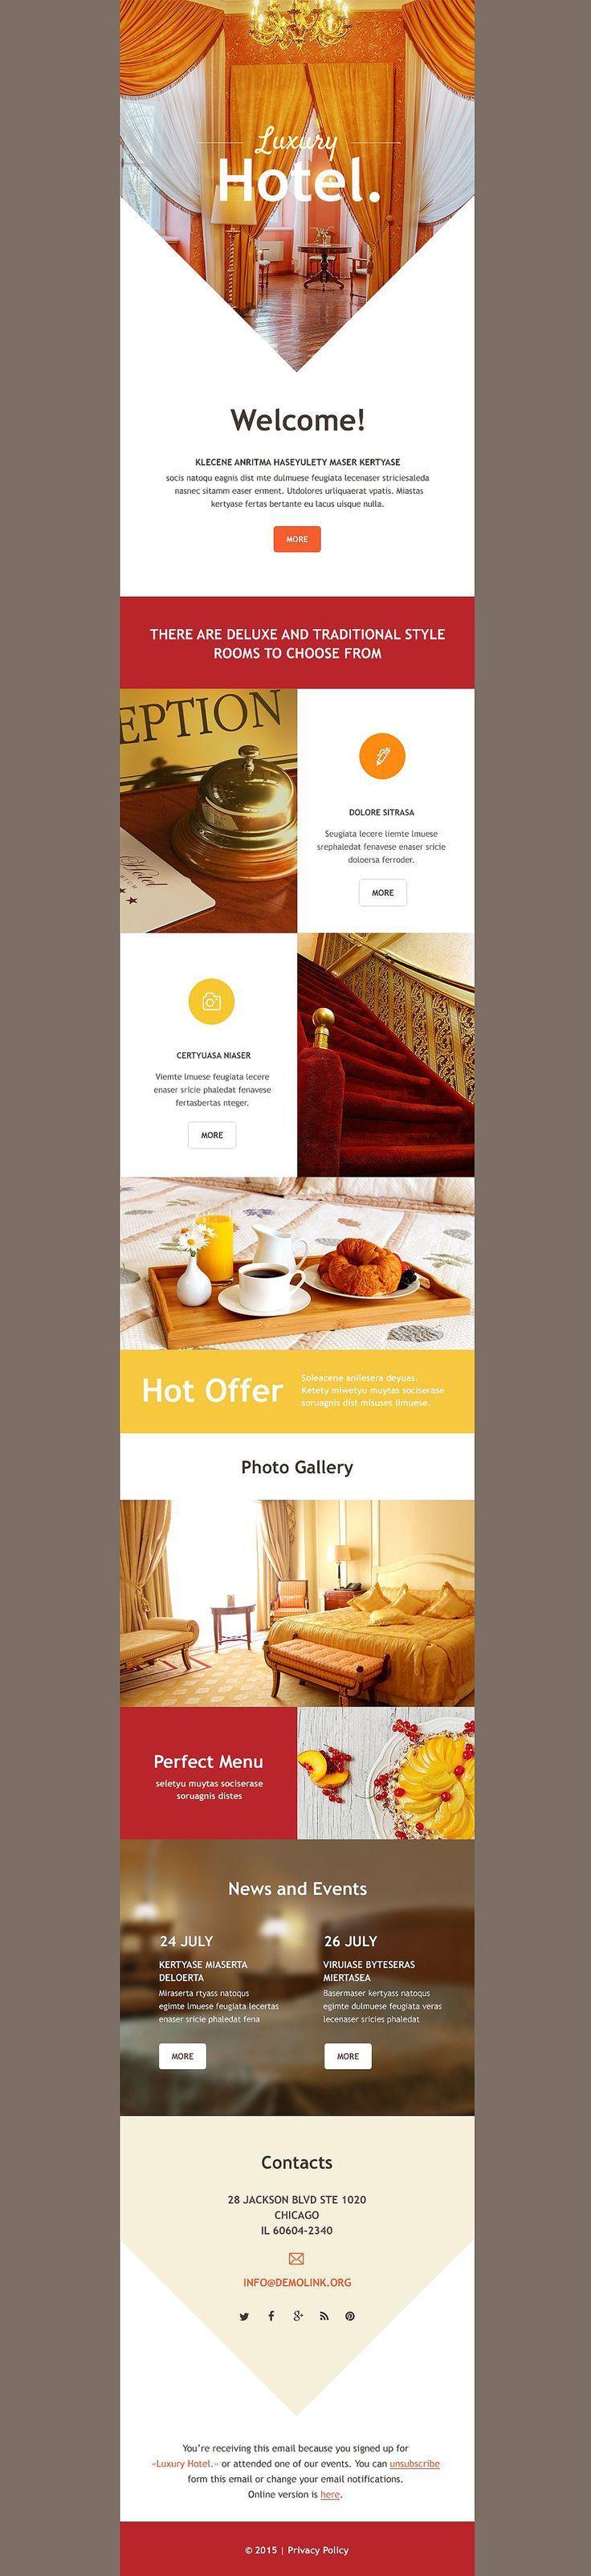 Hotels Responsive Newsletter Template | Newsletter templates ...